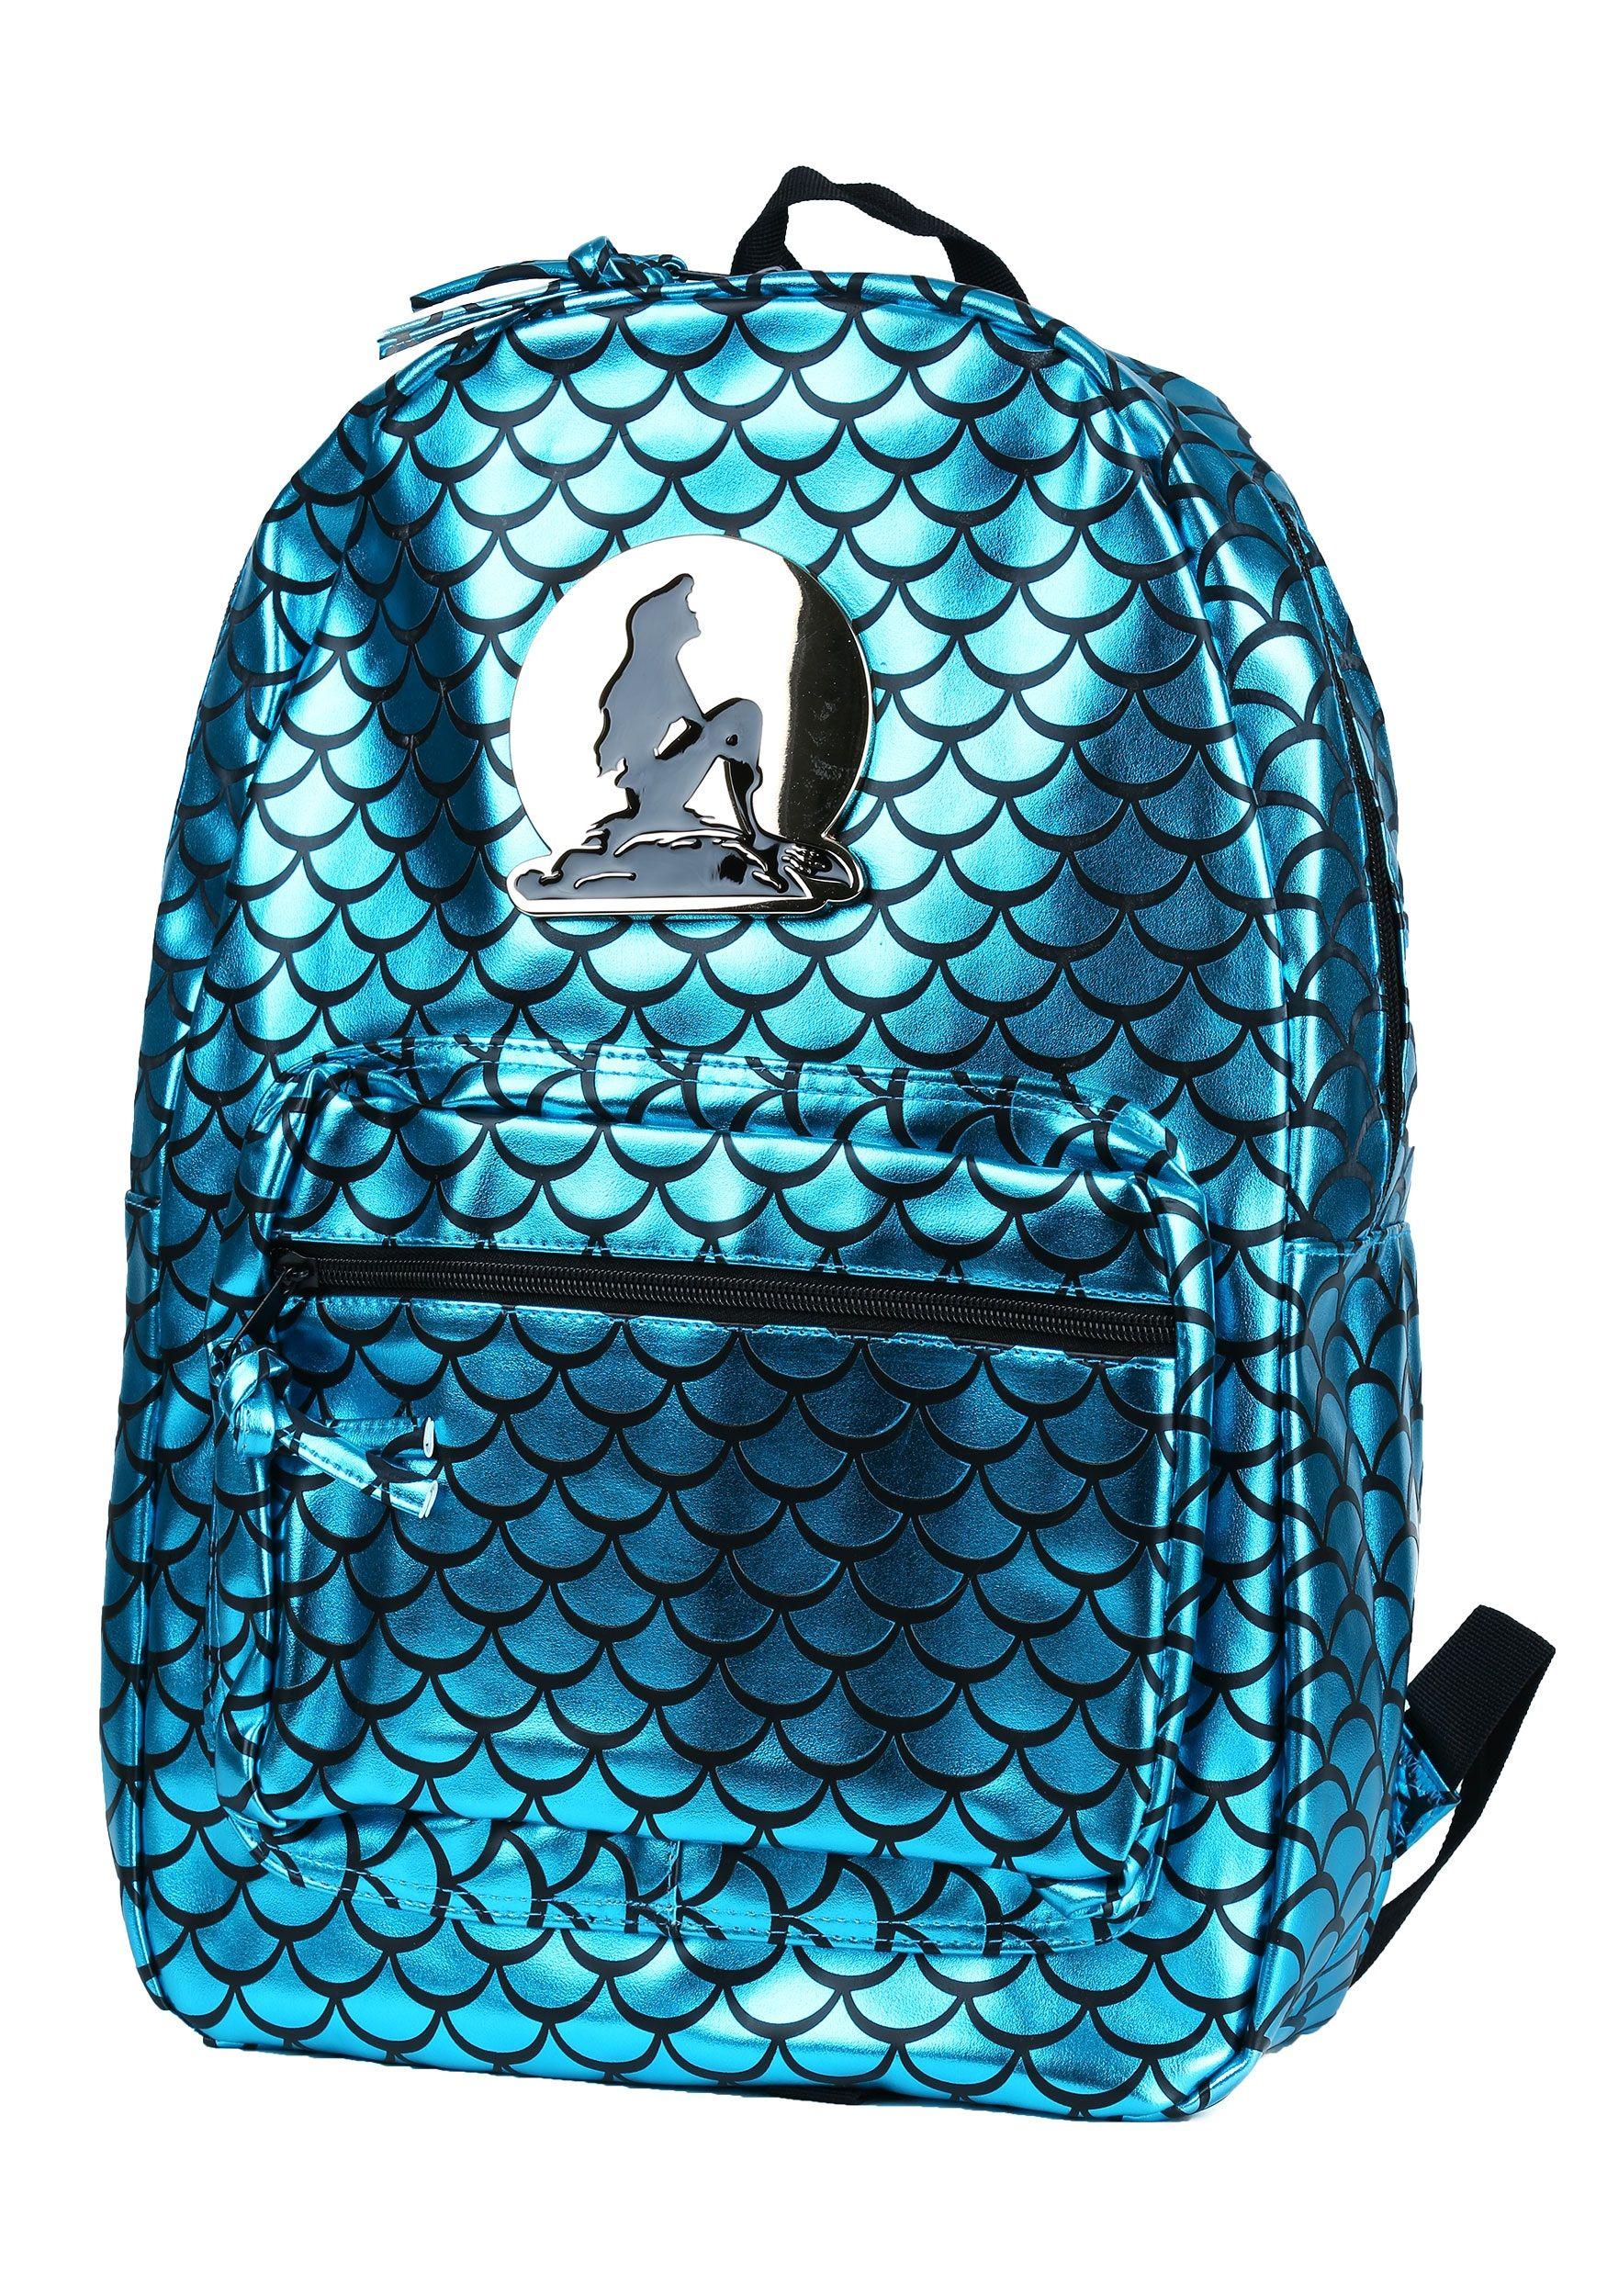 4ab87fa15fa1 Disney Ariel The Little Mermaid Backpack Little Mermaid Gifts